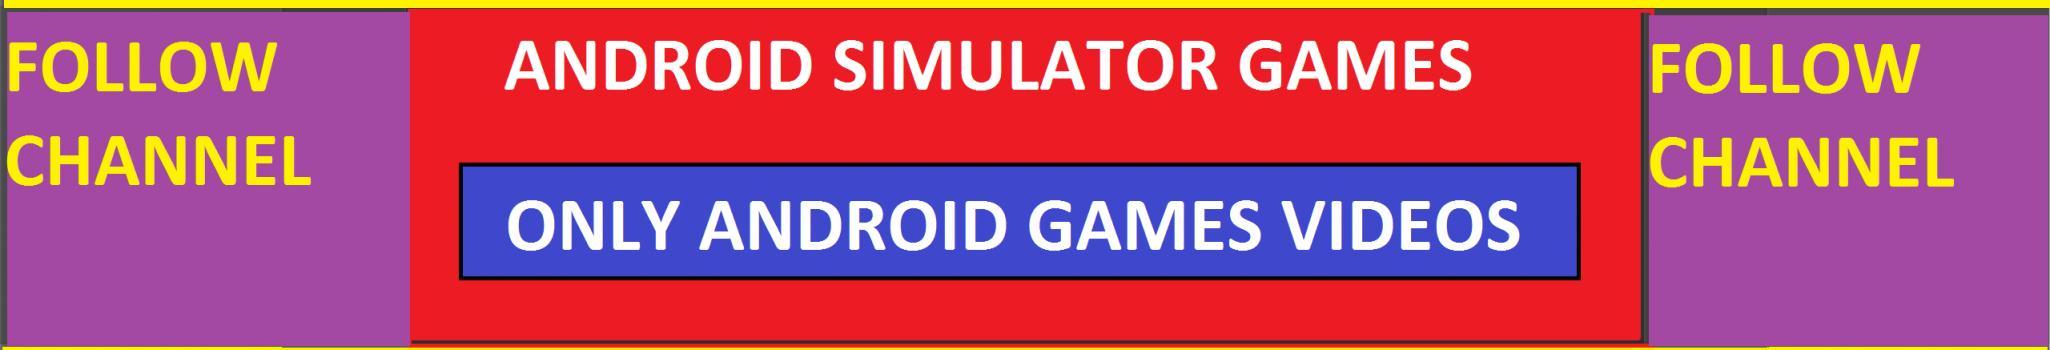 ANDROID SIMULATOR GAMES